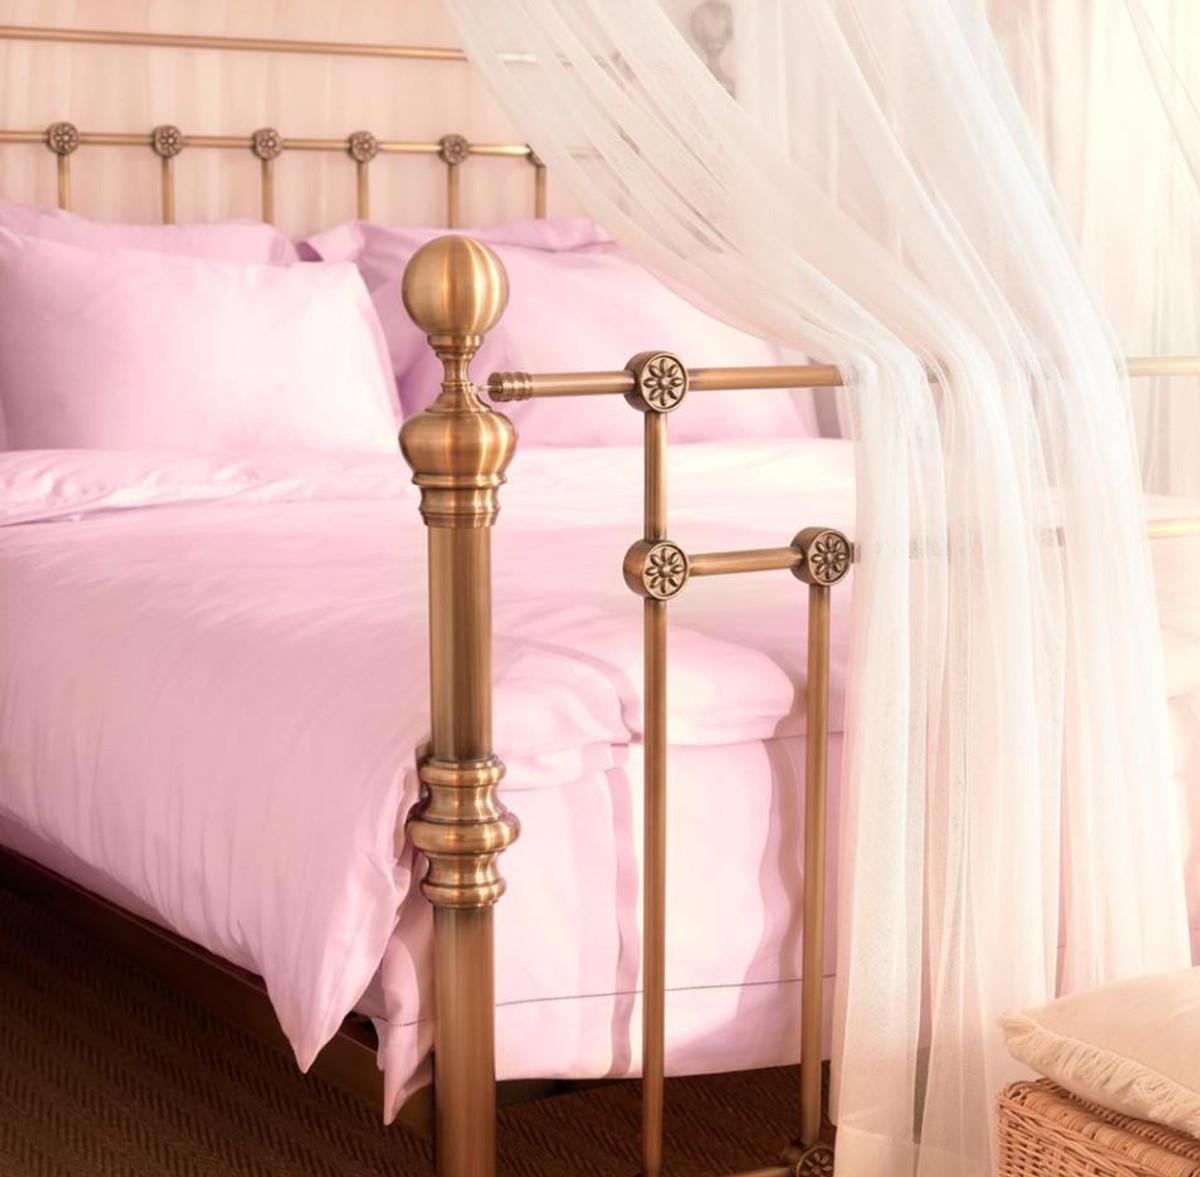 Casa Padrino Luxus Bett Antik Messing 187 x 225,5 x H. 152,5 cm - Designer Möbel 8